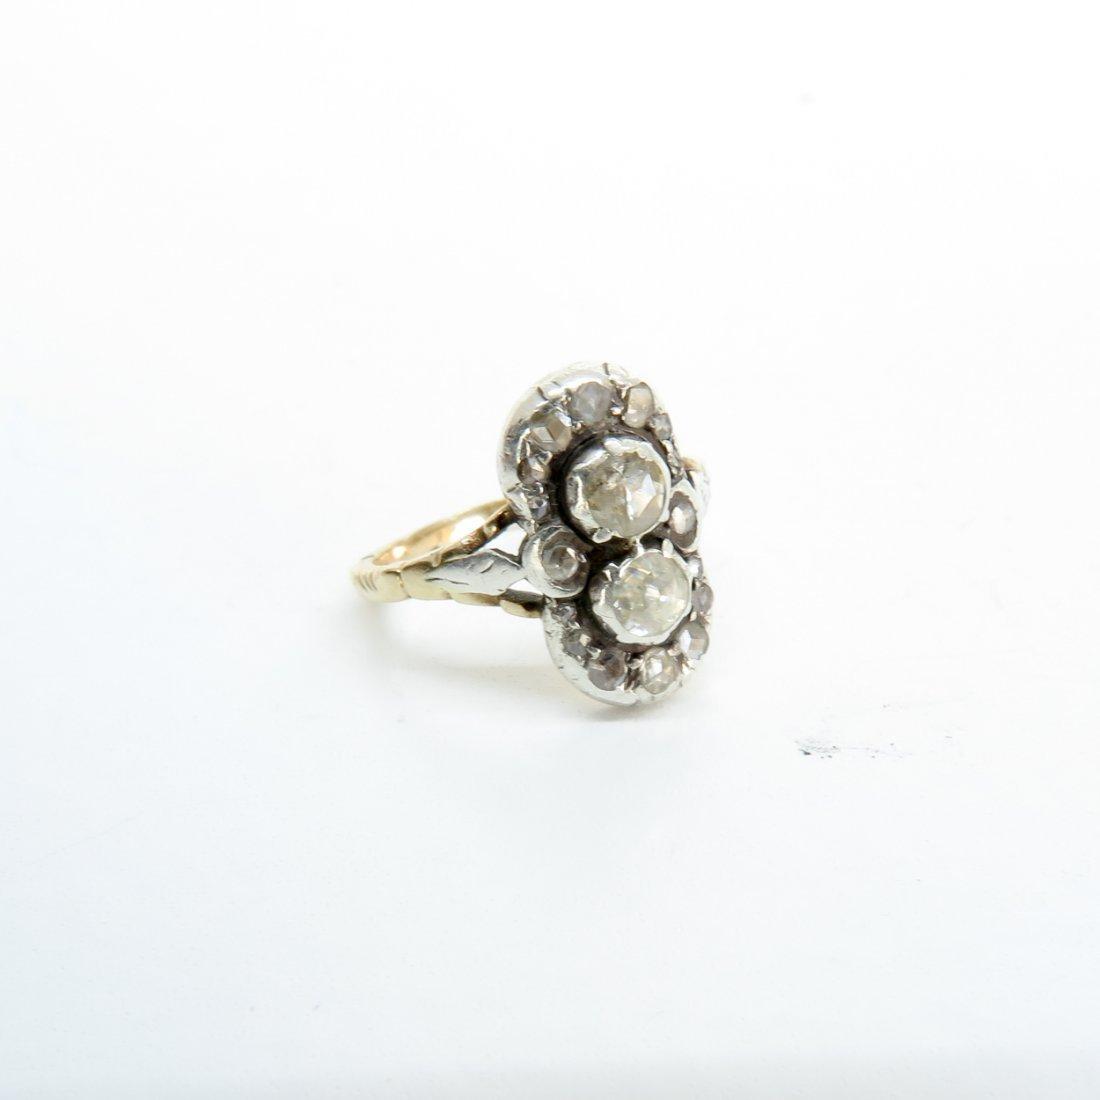 14KG Art Deco Diamond Ring